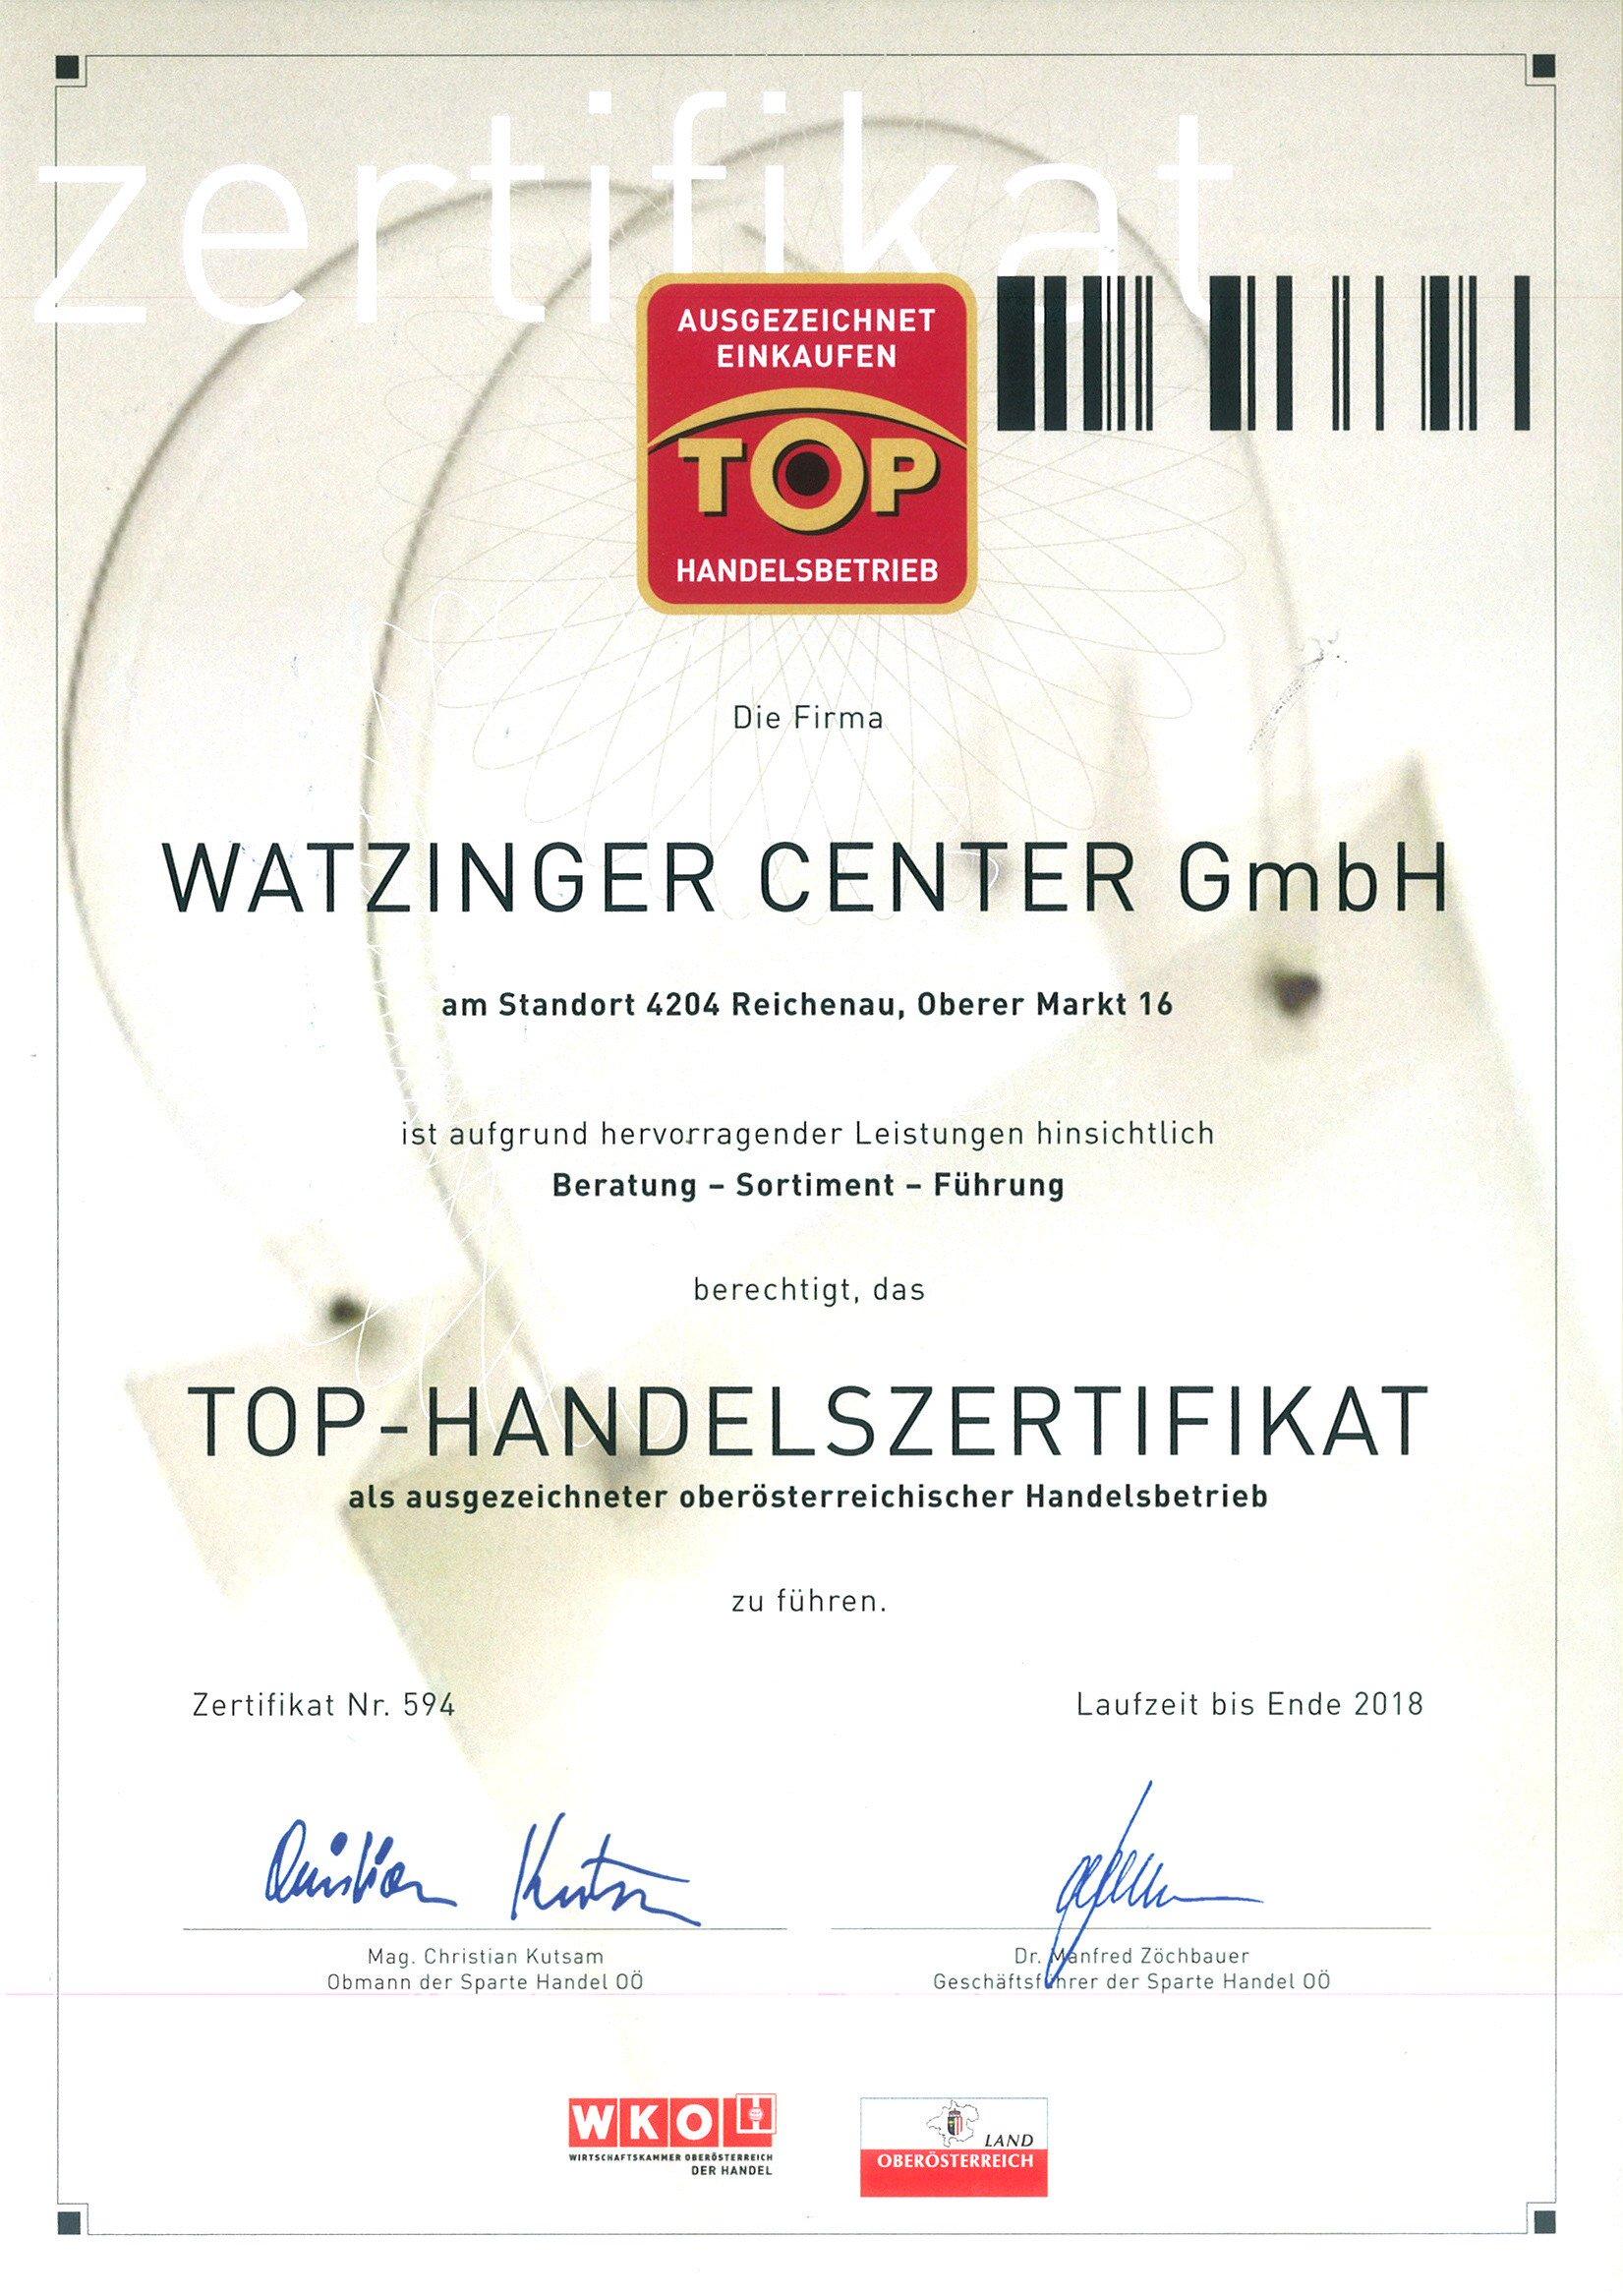 Beste Zertifikate Jetzt Bilder - zertifizierungsstelle ...